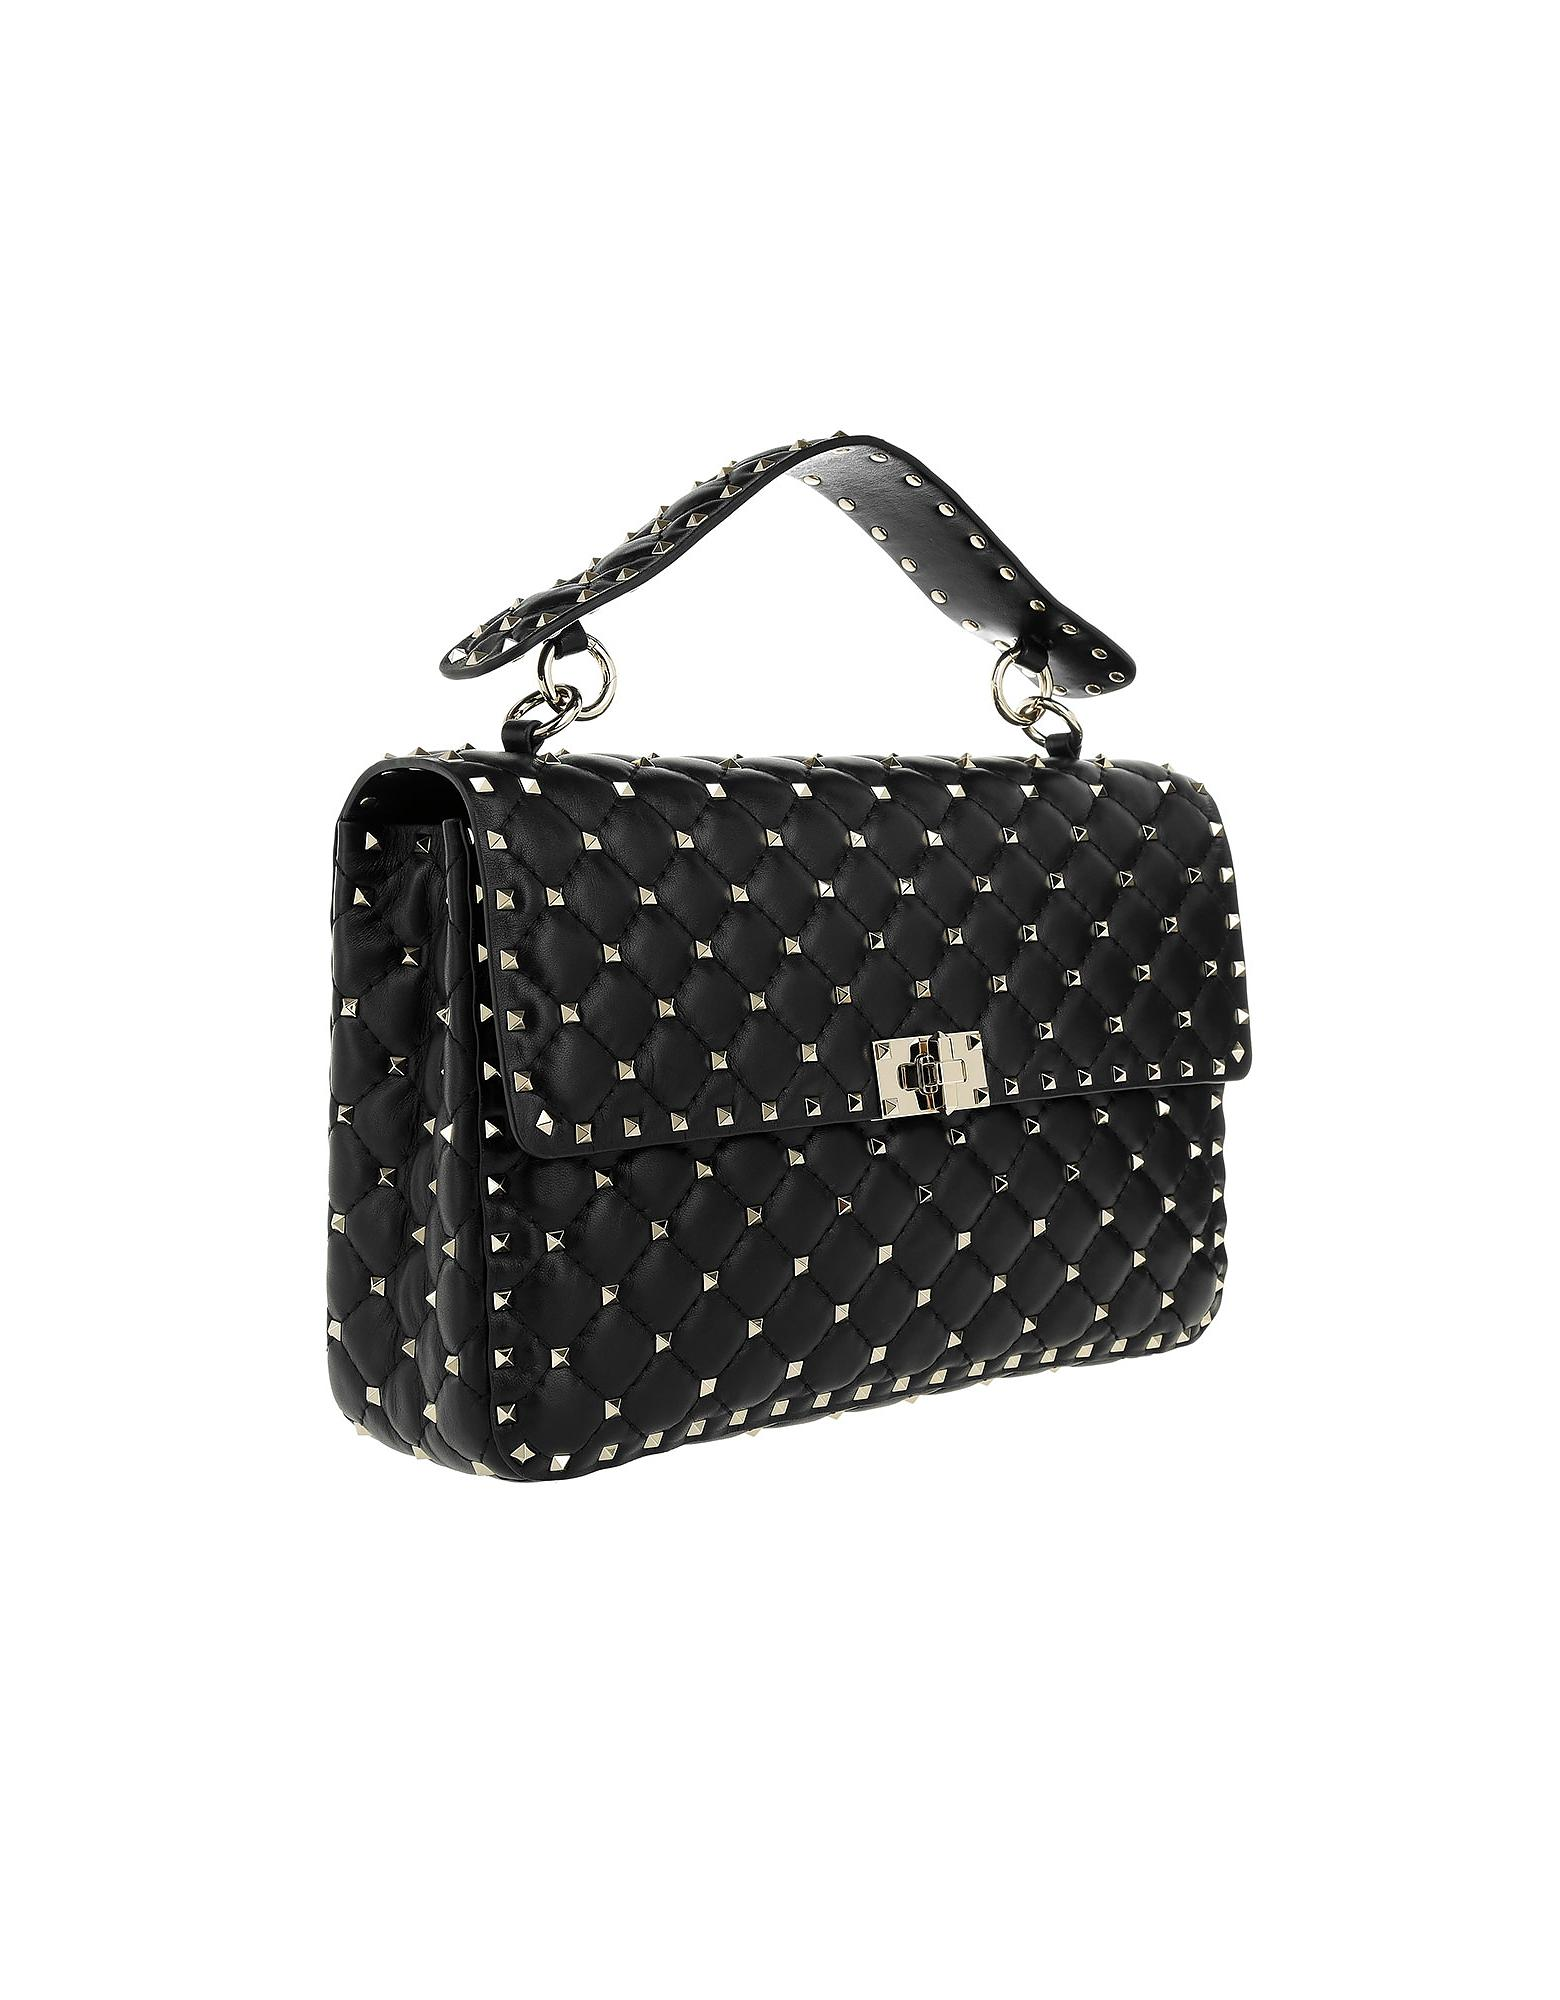 68db2c2d60c0 Lyst - Valentino Rockstud Spike Nappa Large Crossbody Bag Black in Black